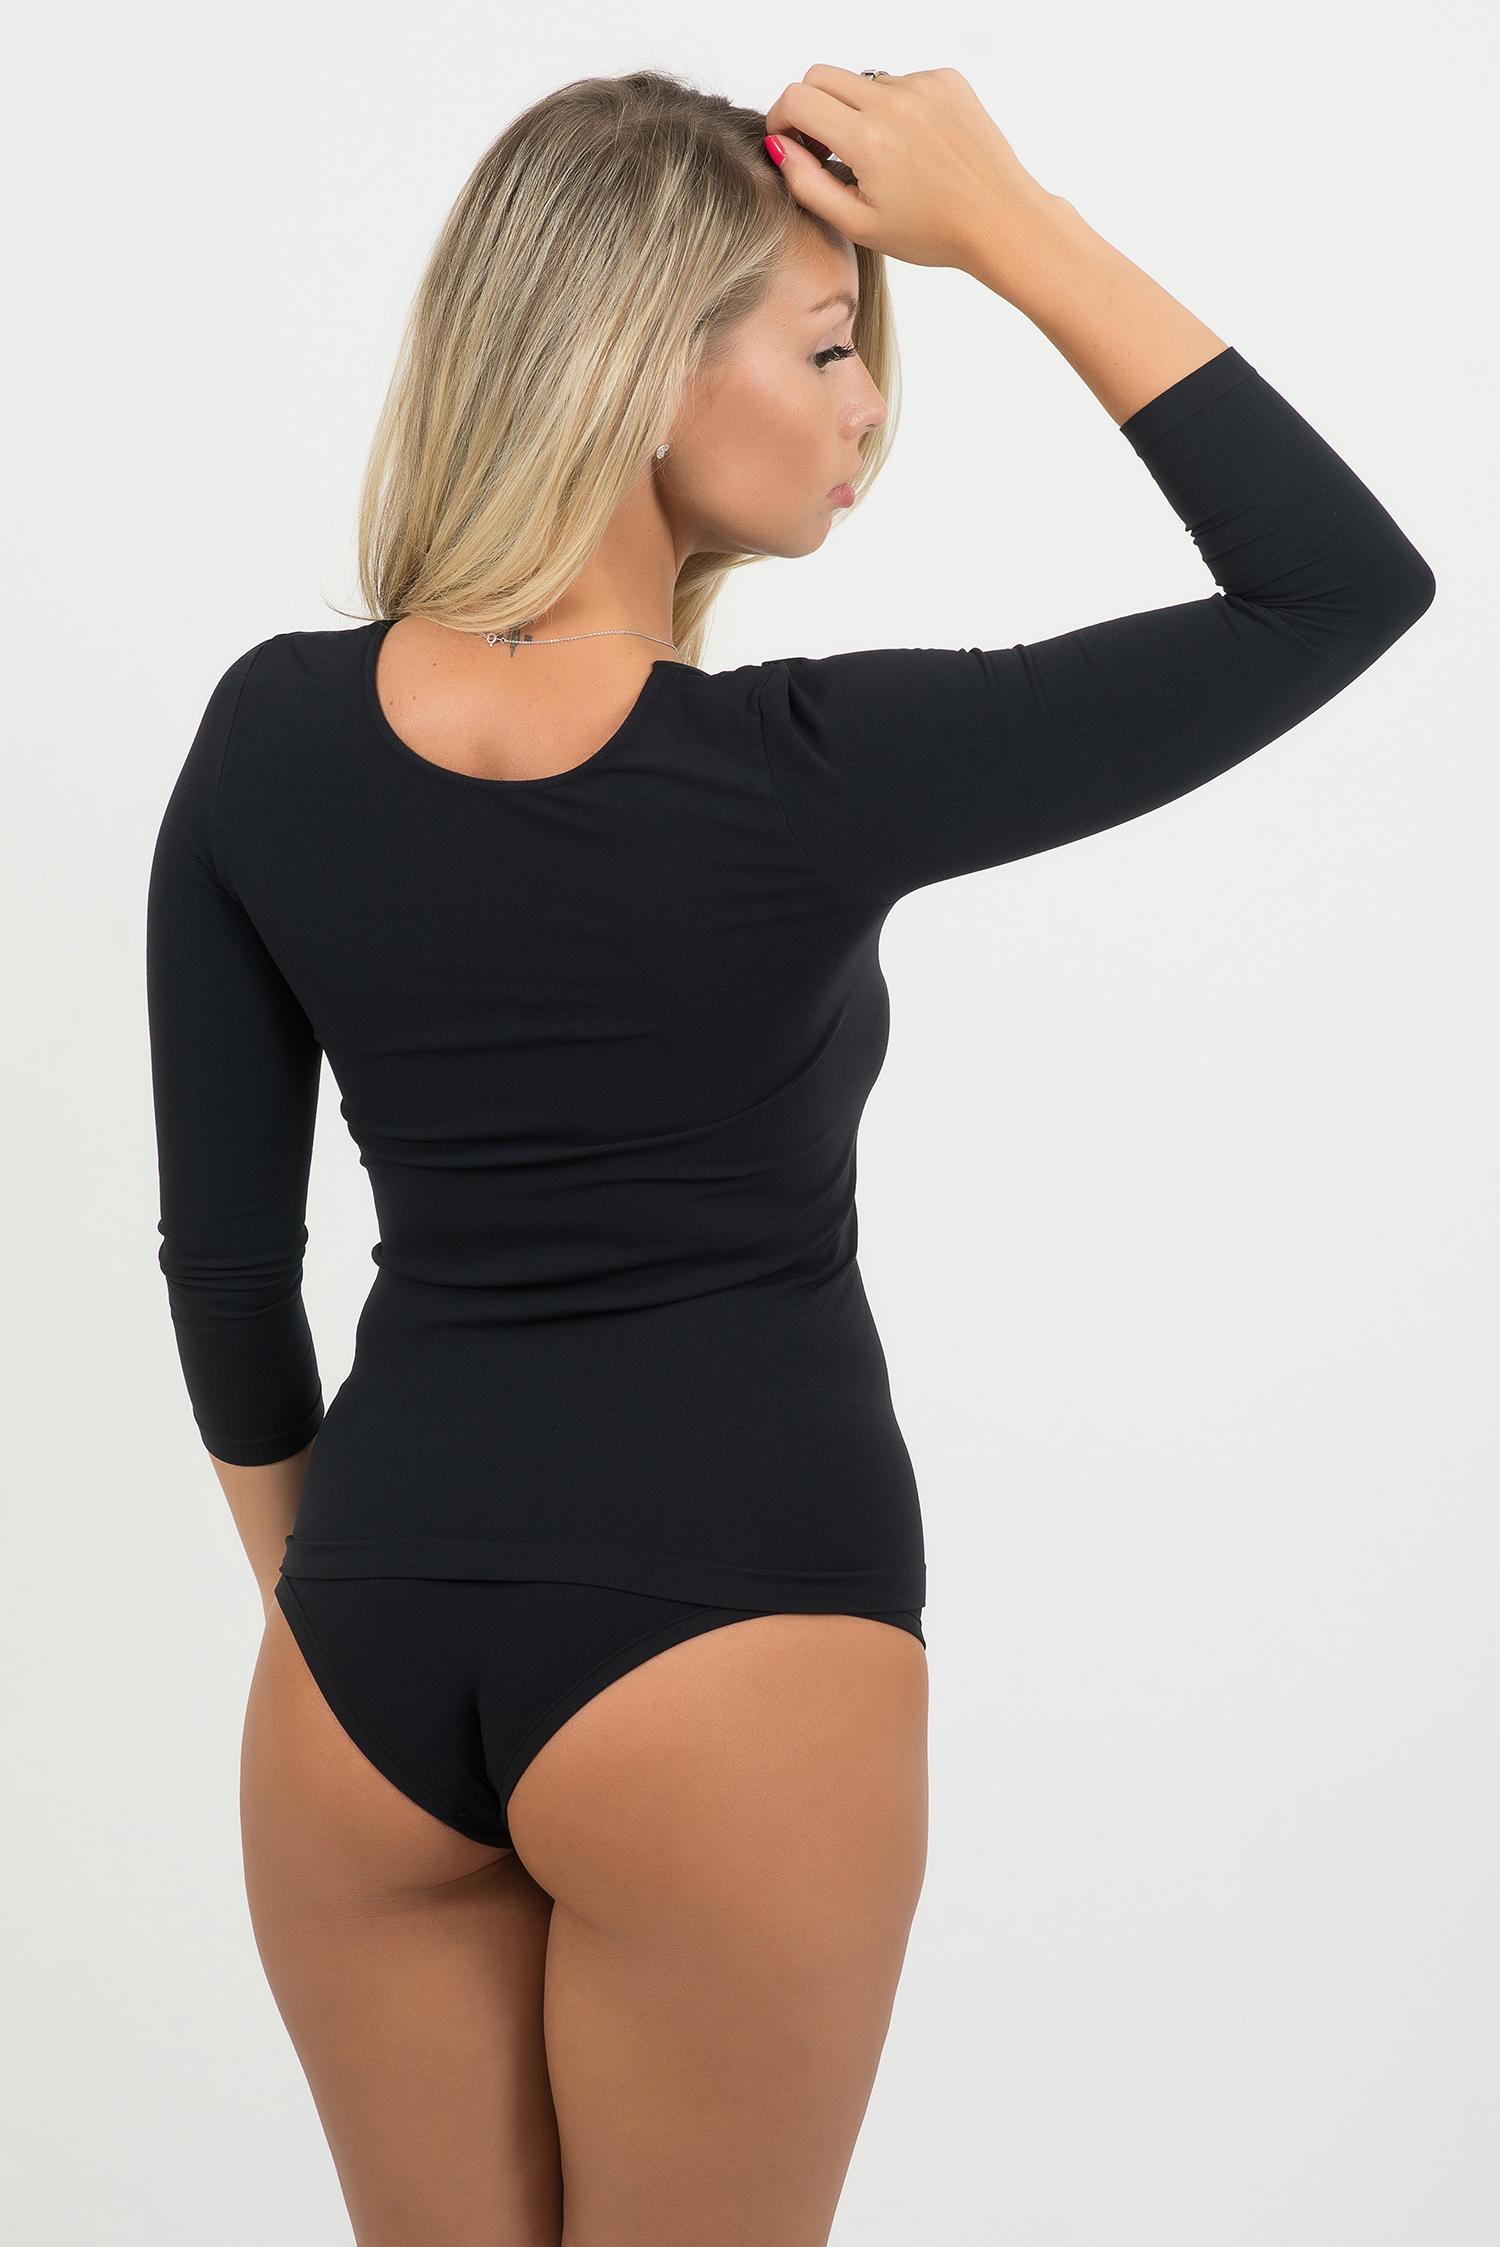 Bellissima-Women-039-s-3-4-Sleeve-Scoop-Neck-T-Shirt-Seamless-Stretch-Basic-Top thumbnail 16